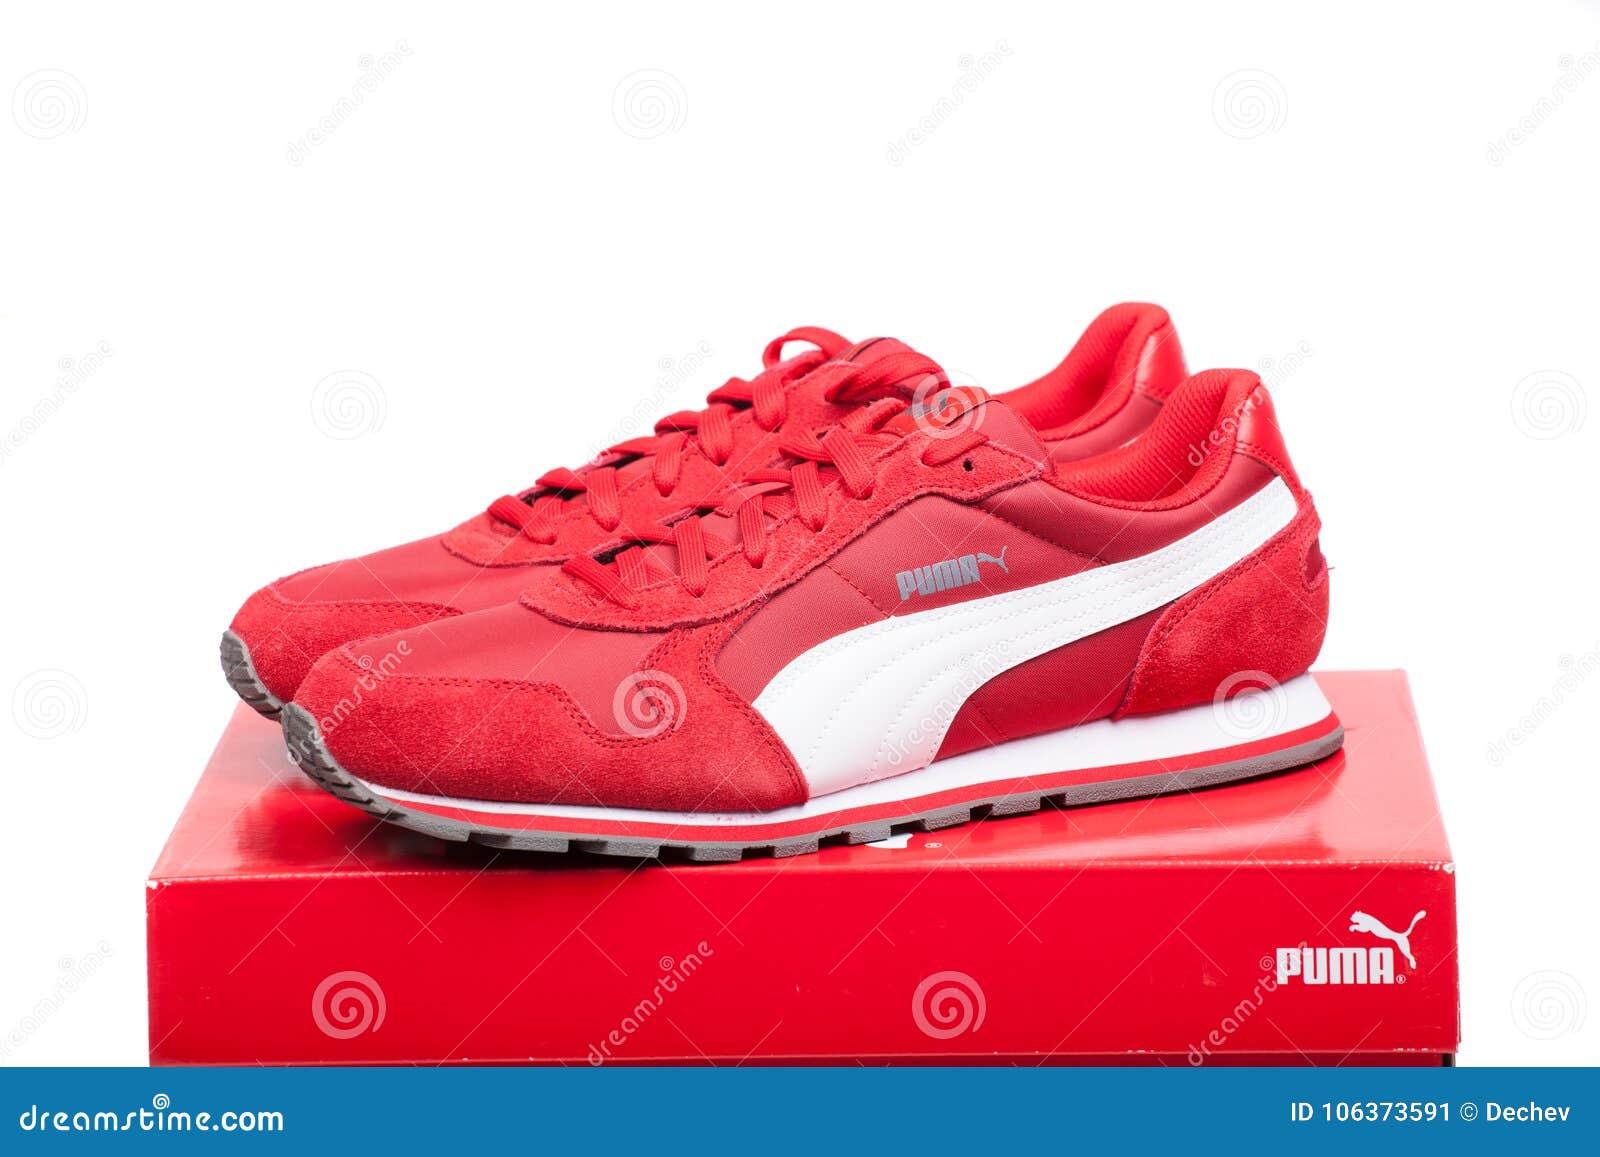 puma chaussure société